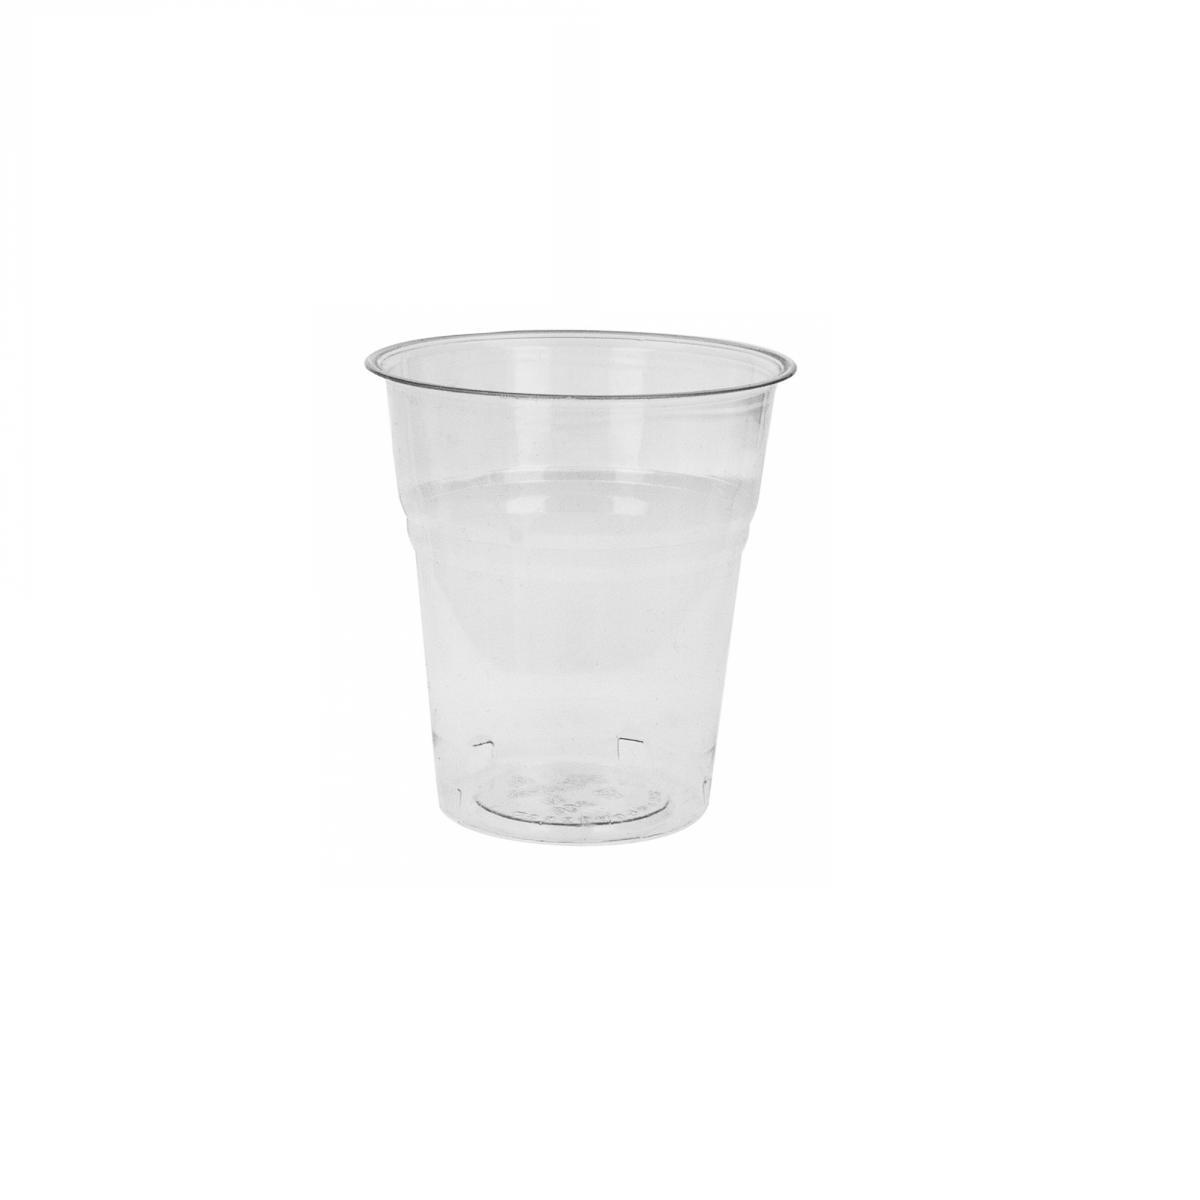 Gobelet compostabe biodégradable en PLA 200 ml CN08-22399 -3